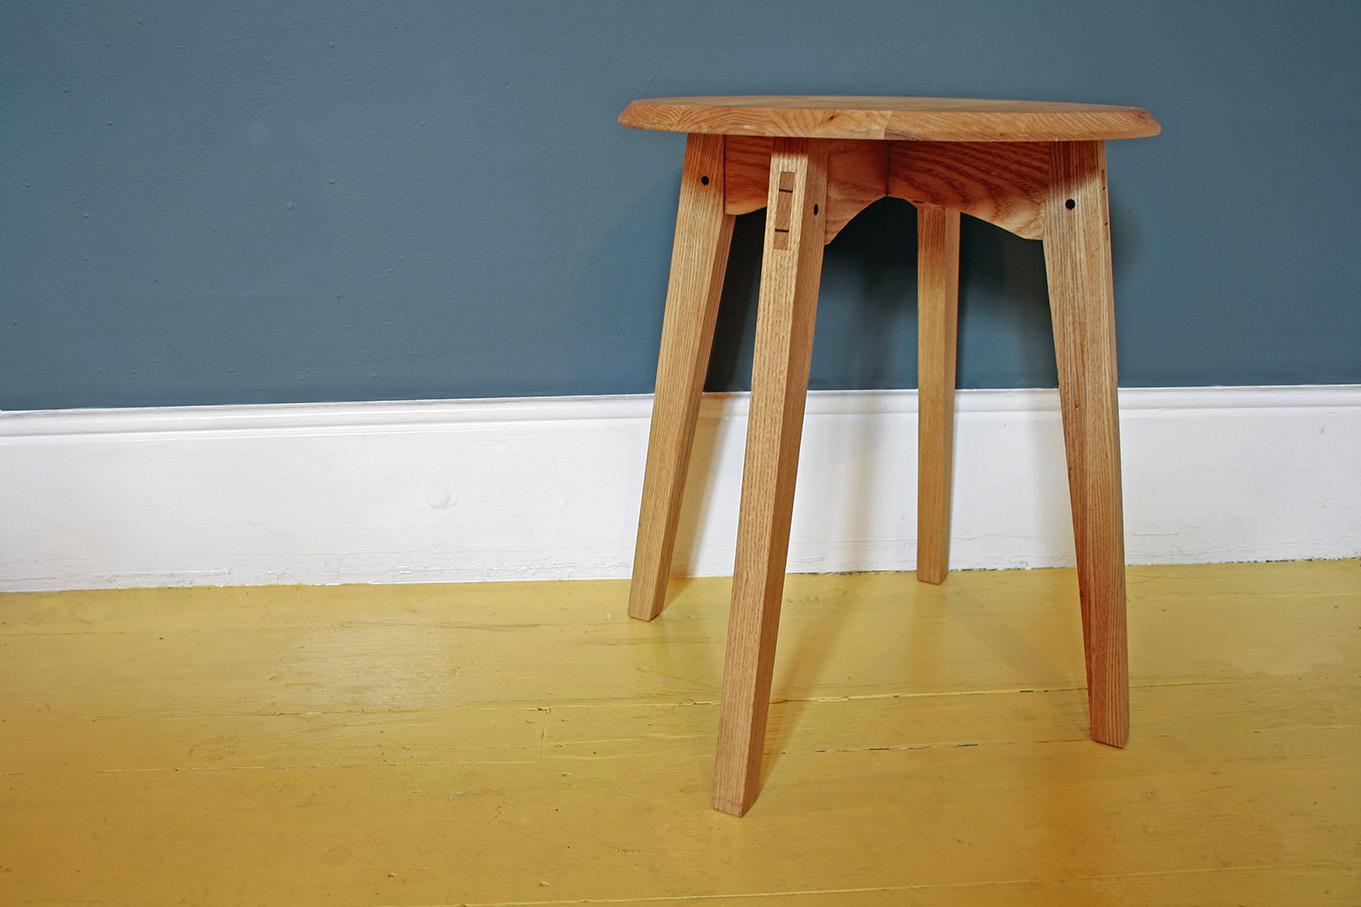 furniture maker bristol, bespoke table, arbor furniture